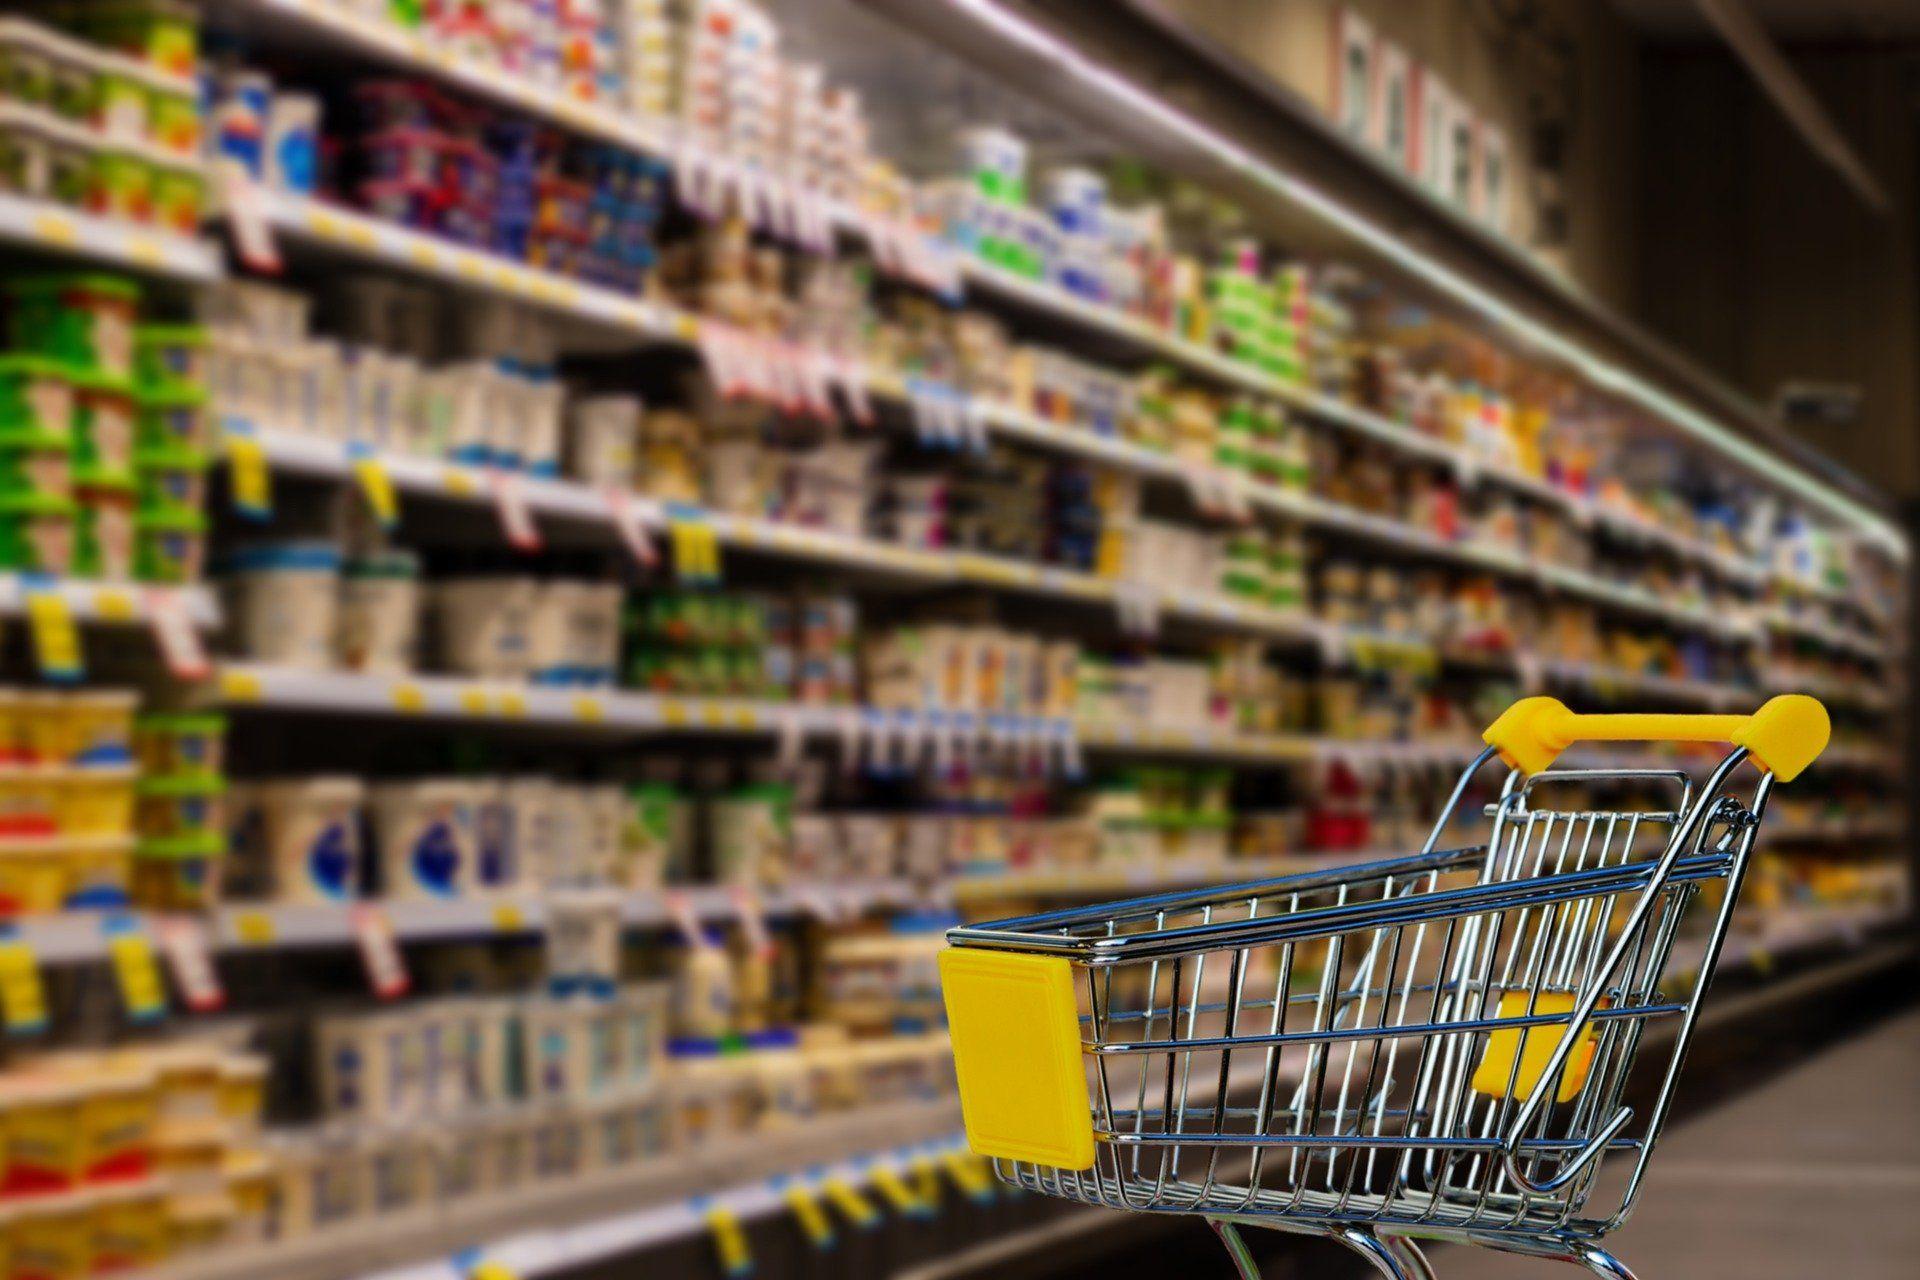 Fotografia Franquicias de supermercados durante el Covid-19